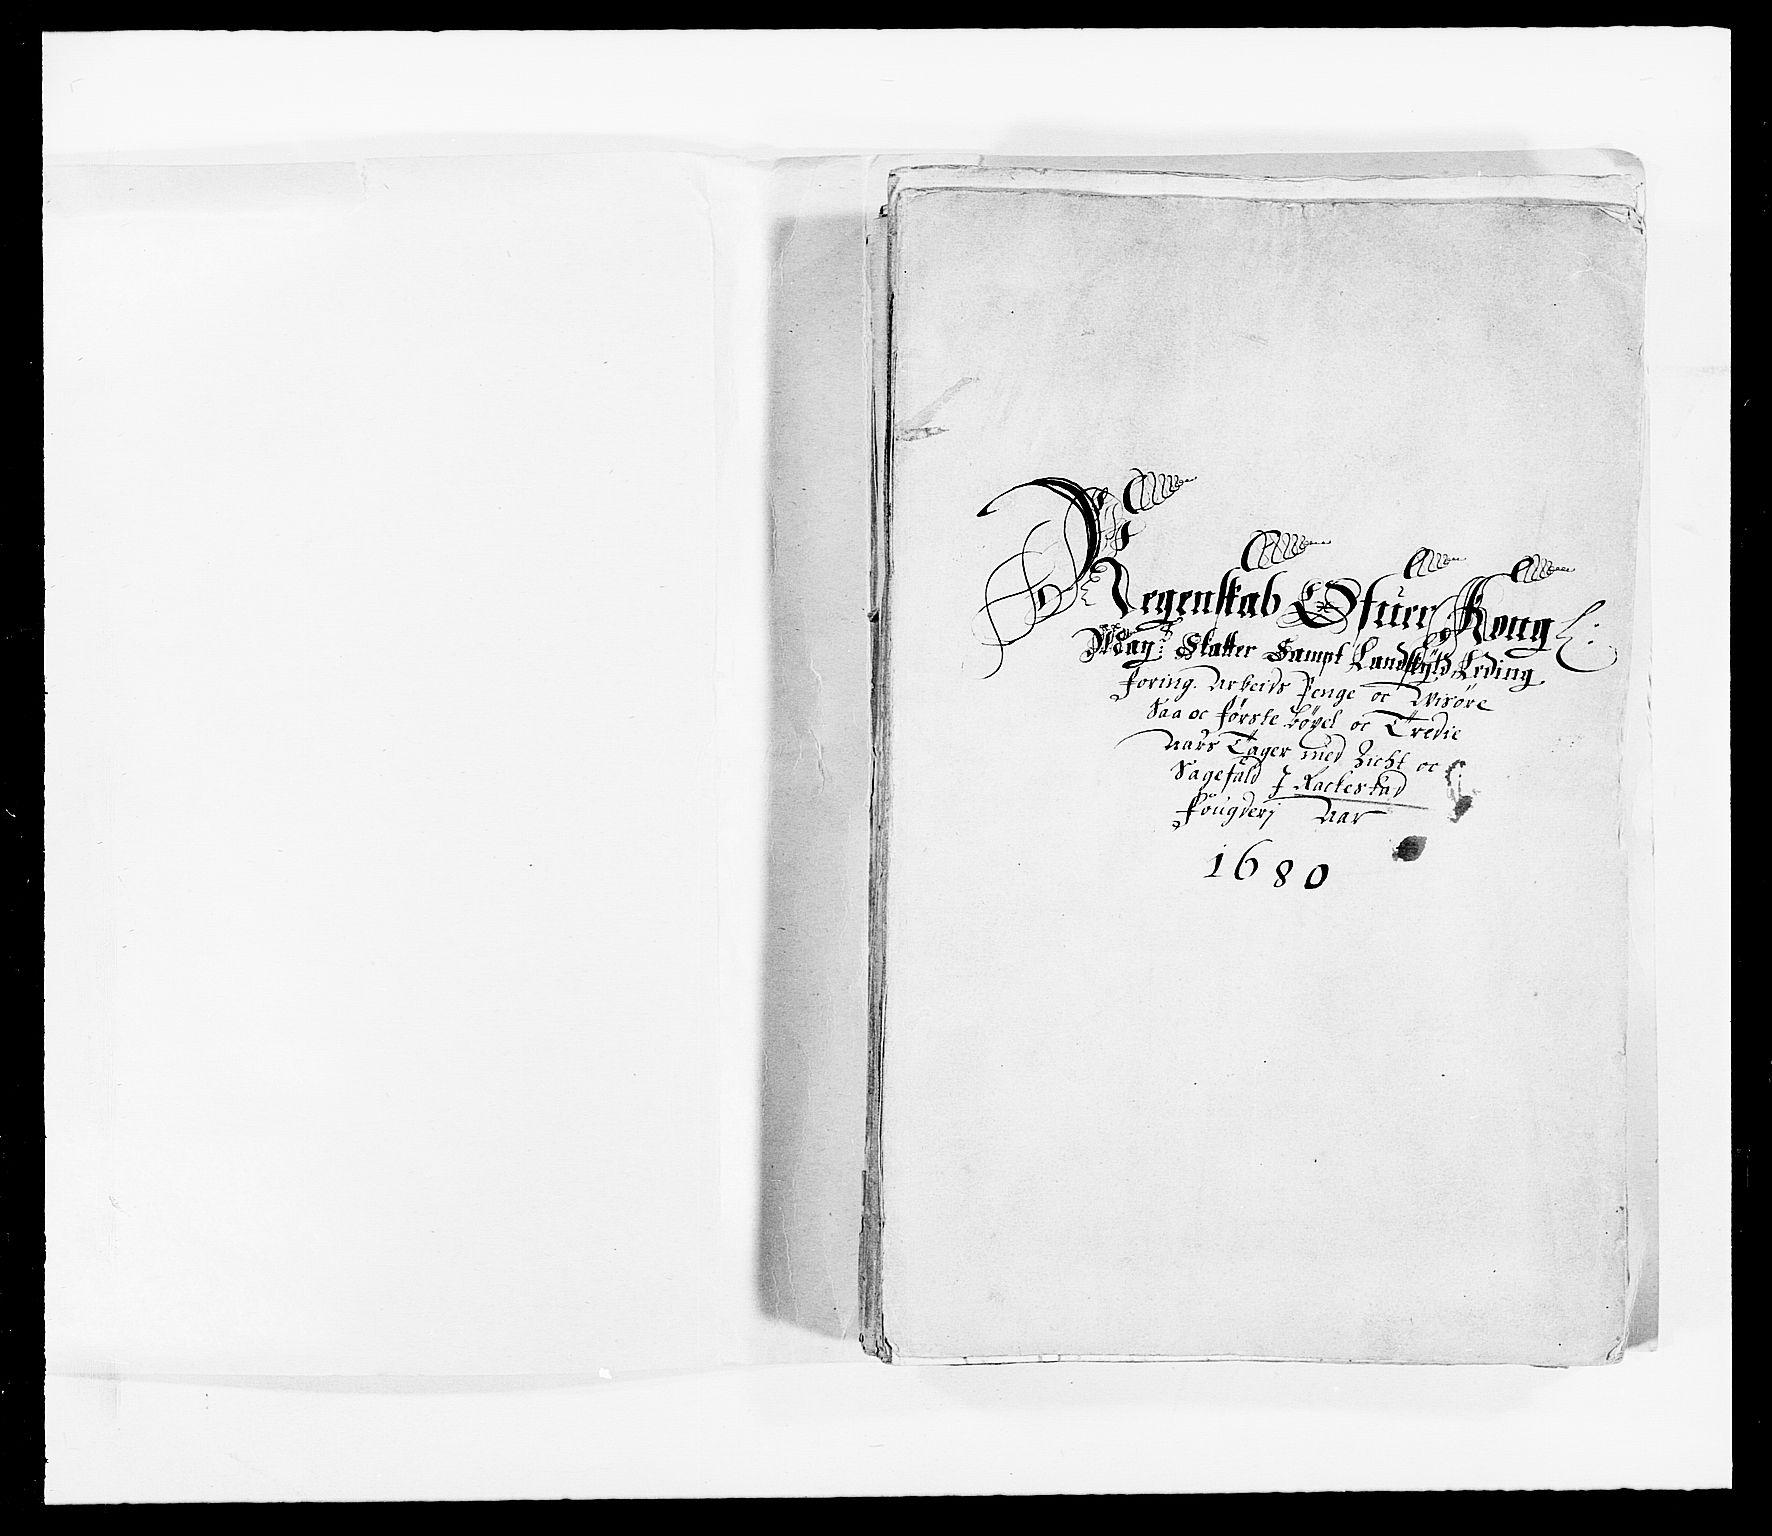 RA, Rentekammeret inntil 1814, Reviderte regnskaper, Fogderegnskap, R05/L0272: Fogderegnskap Rakkestad, 1680-1681, s. 2